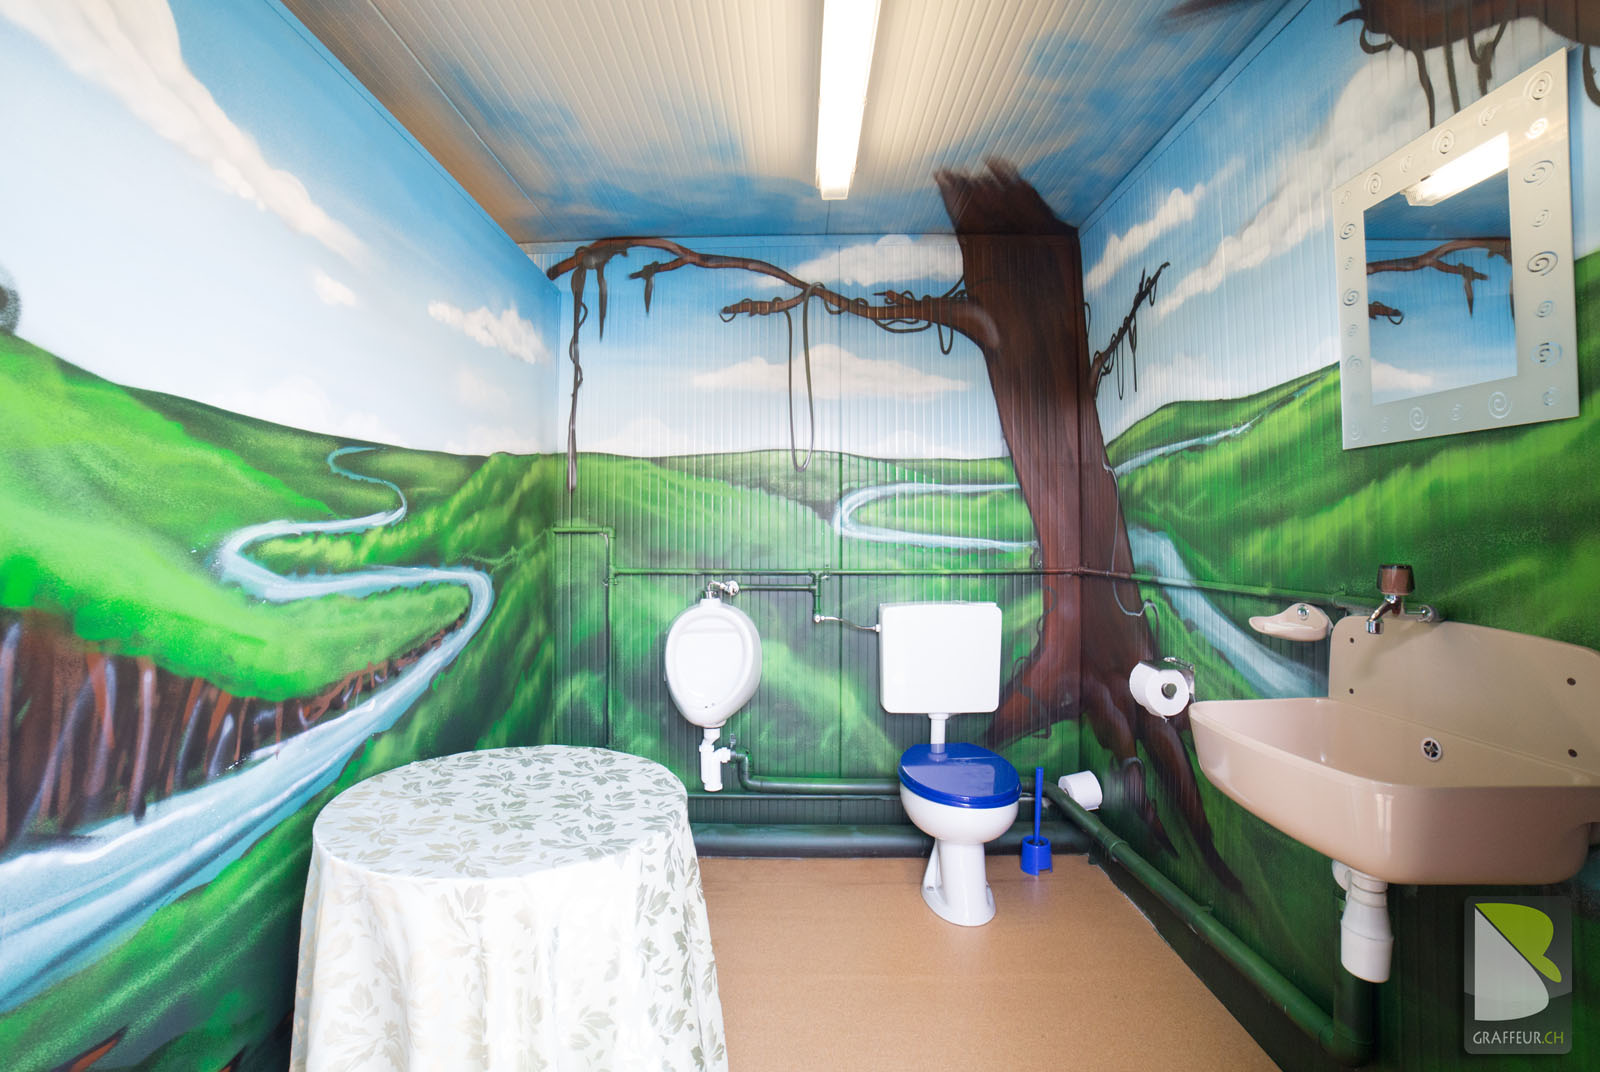 Accessoire Salle De Bain Jungle ~ salle de bain jungle objet deco salle de bain gnialdco la salle de